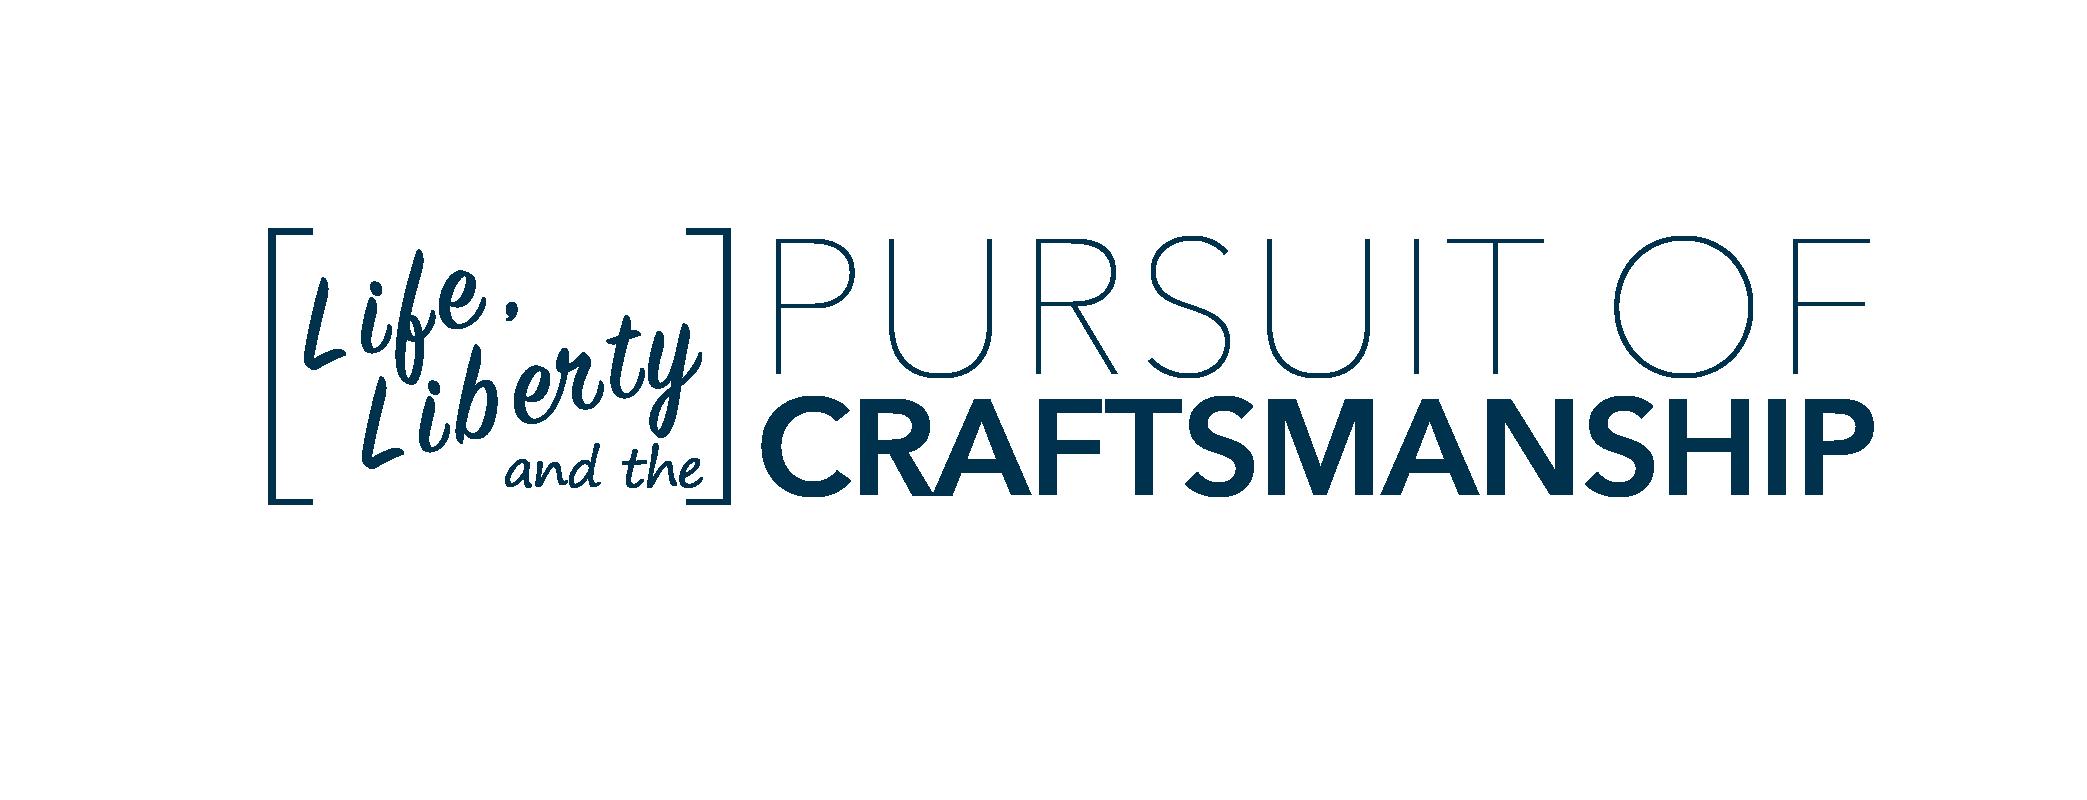 Pursuit of Craftsmanship